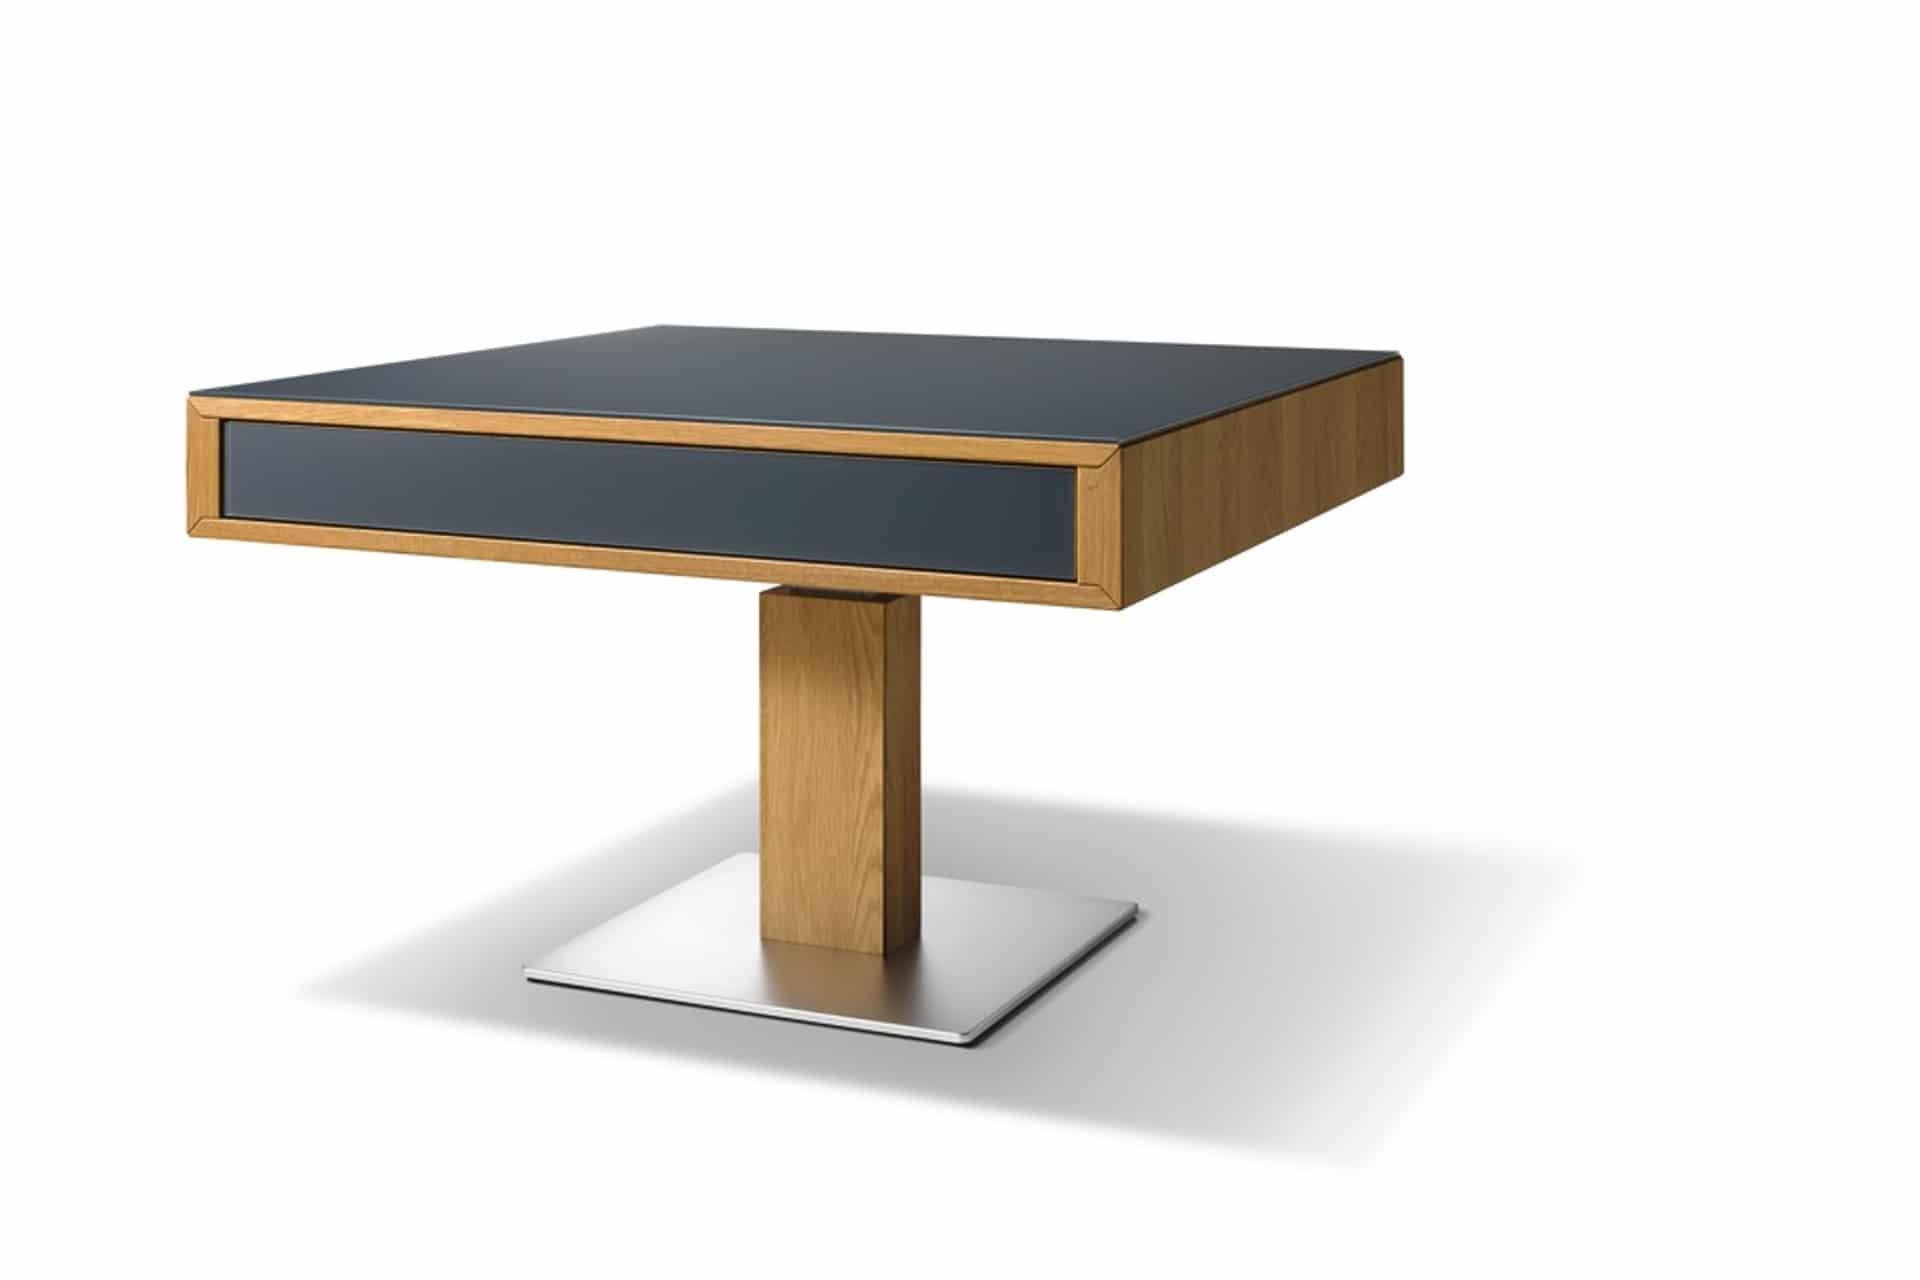 couchtisch lift martin wagner massivholzm bel gmbh. Black Bedroom Furniture Sets. Home Design Ideas